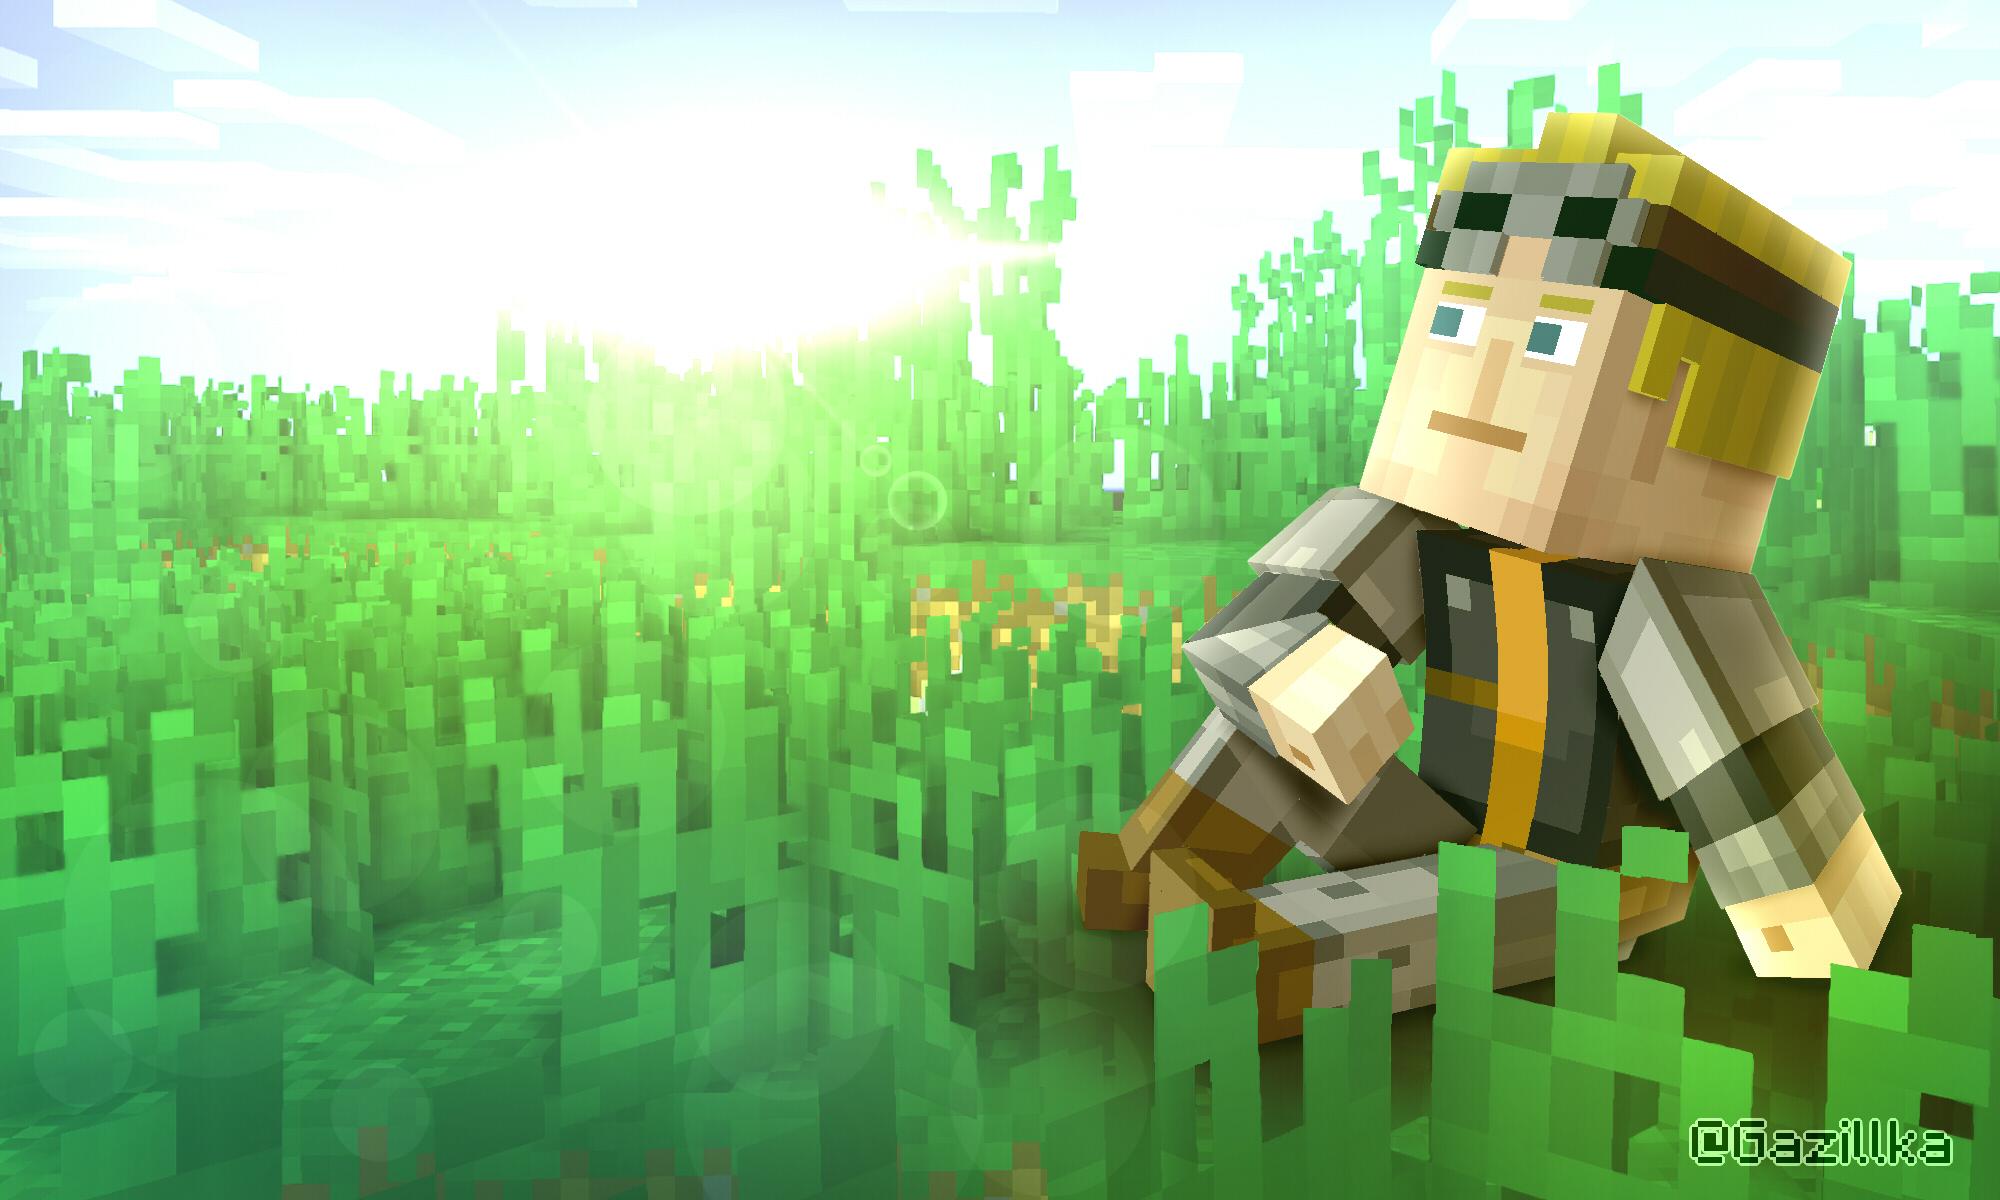 Minecraft Story Mode 2 Lukas Chilling By Gazillka On